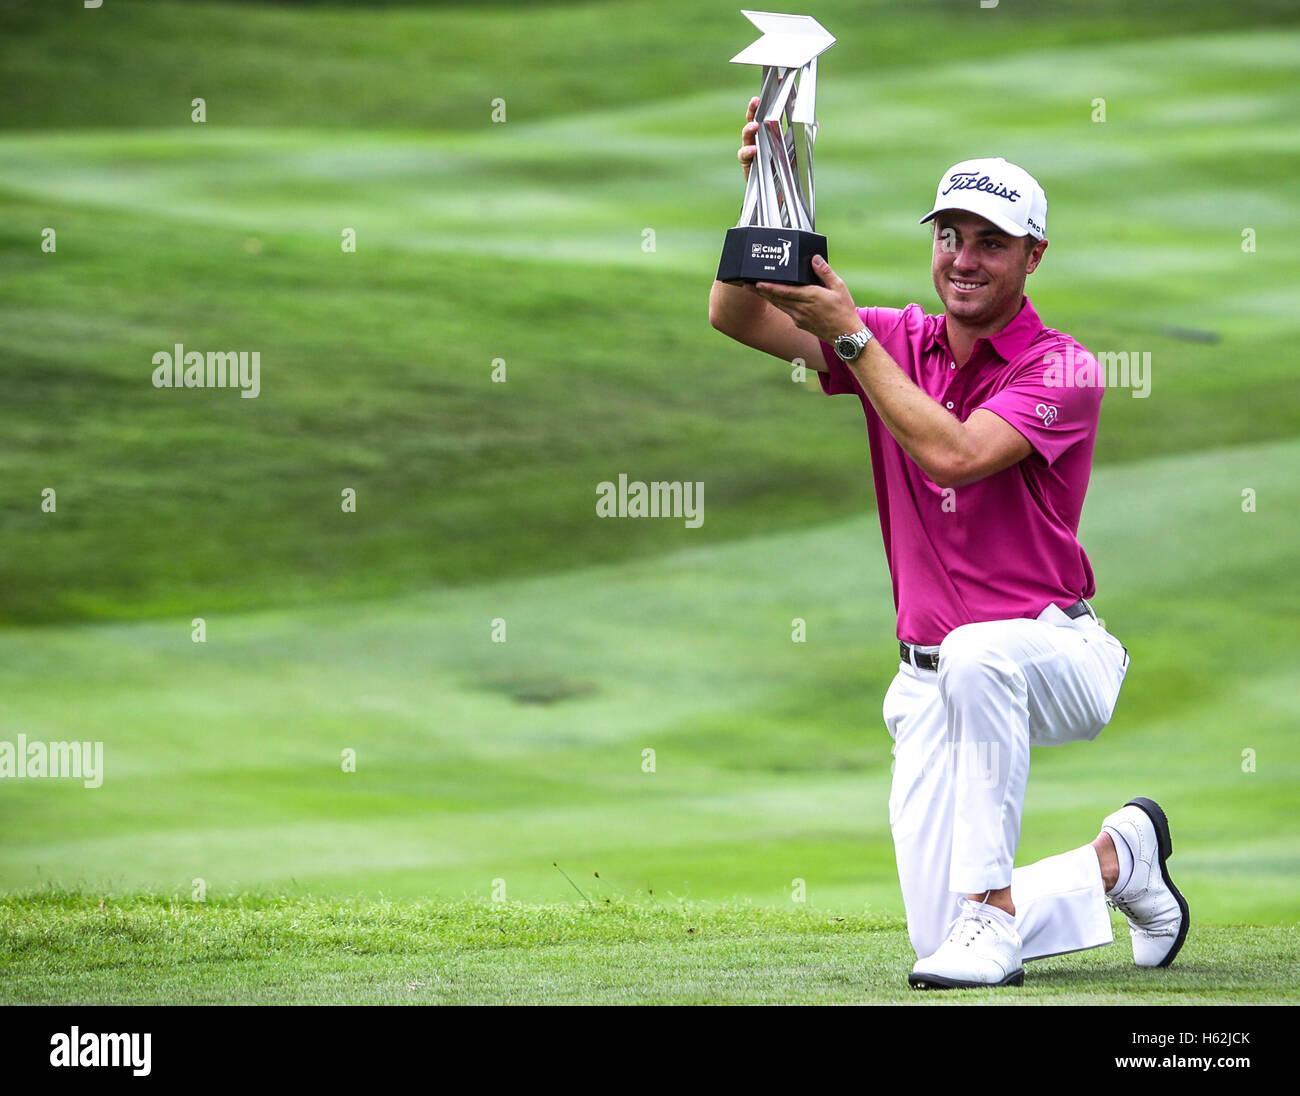 Kuala Lumpur, Malaysia, 23. Oktober 2016. US-Golfer, Justin Thomas mit der Trophäe nach Sieg der CIMB Classic 2016 Stockfoto